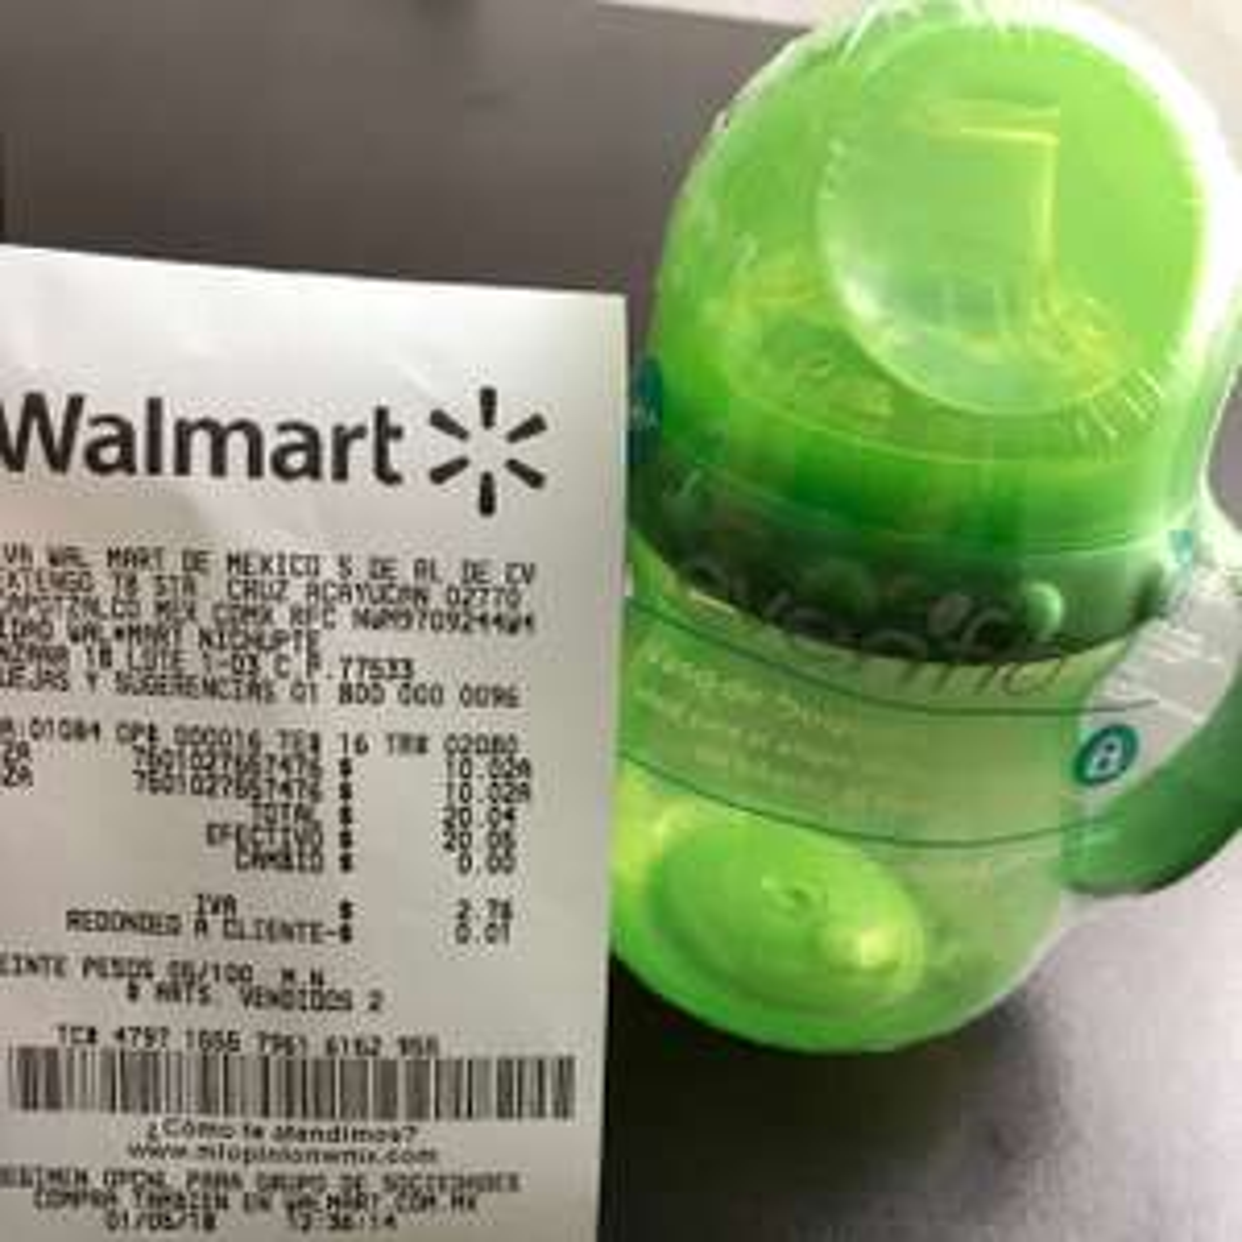 Walmart nichupte cancun: vaso entrenador $10.02